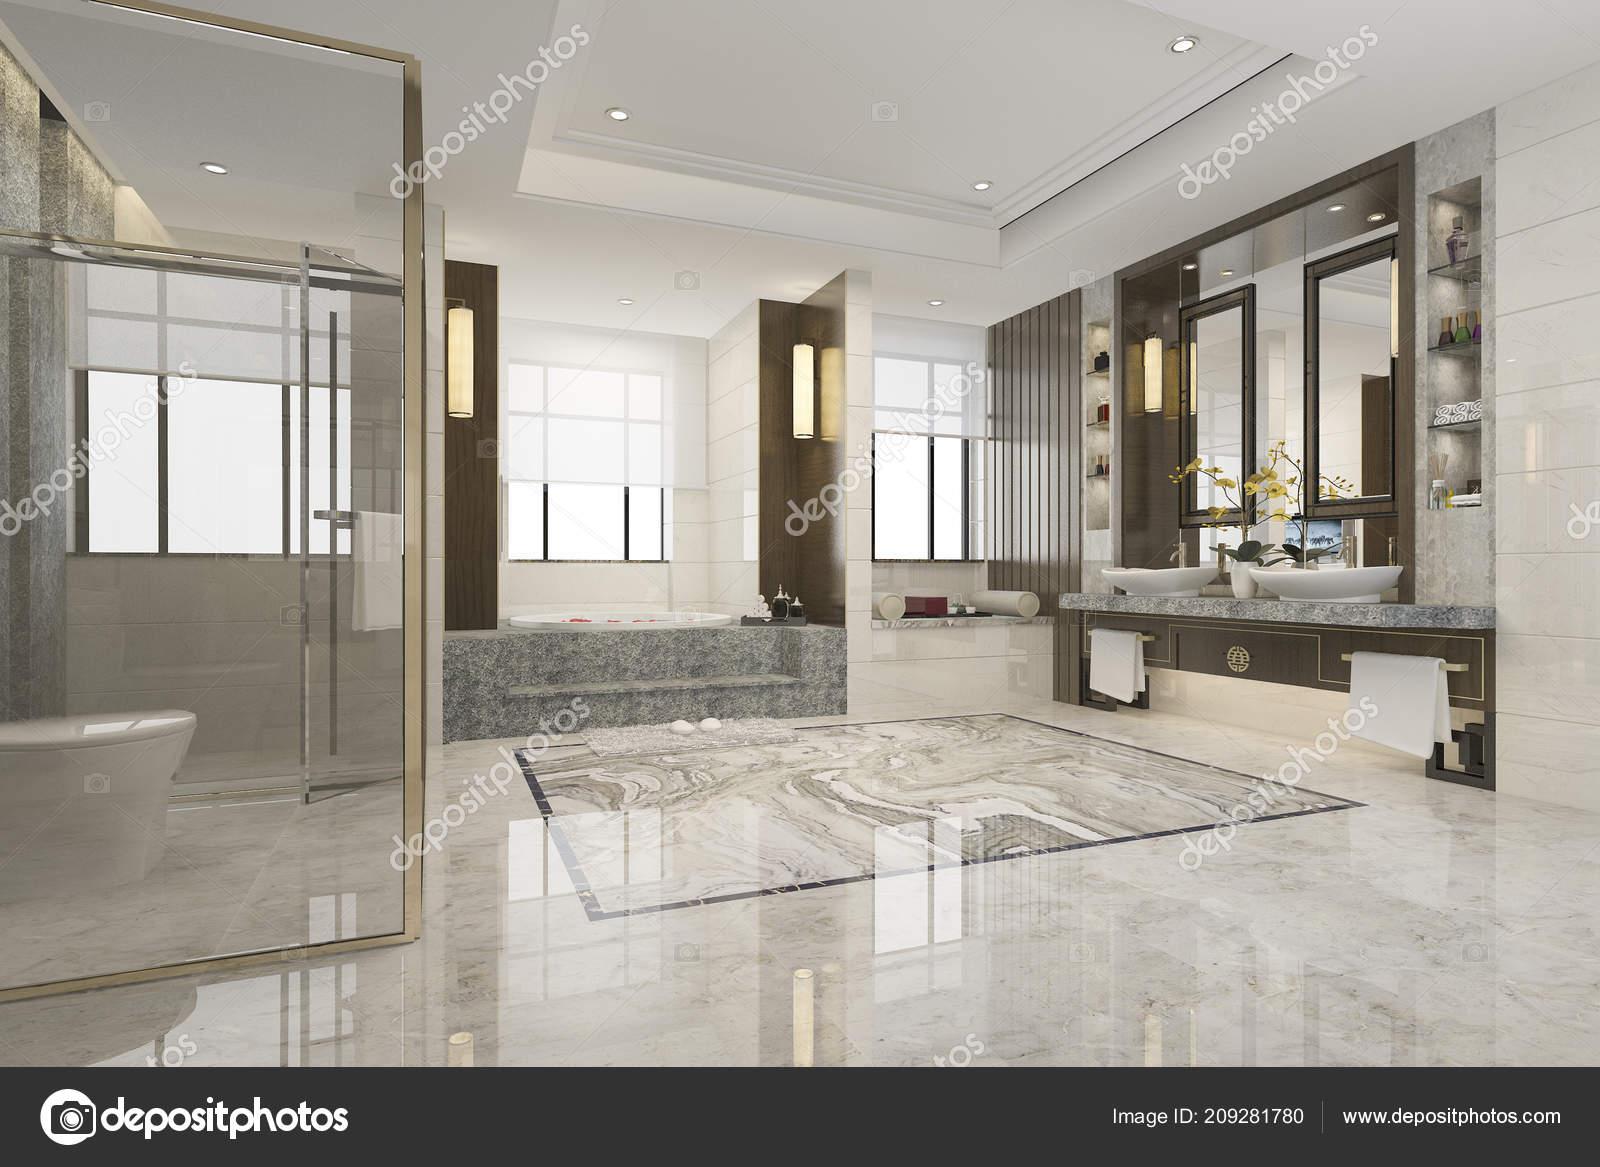 Luxe Rendu Moderne Design Salle Bain — Photographie dit26978 ...